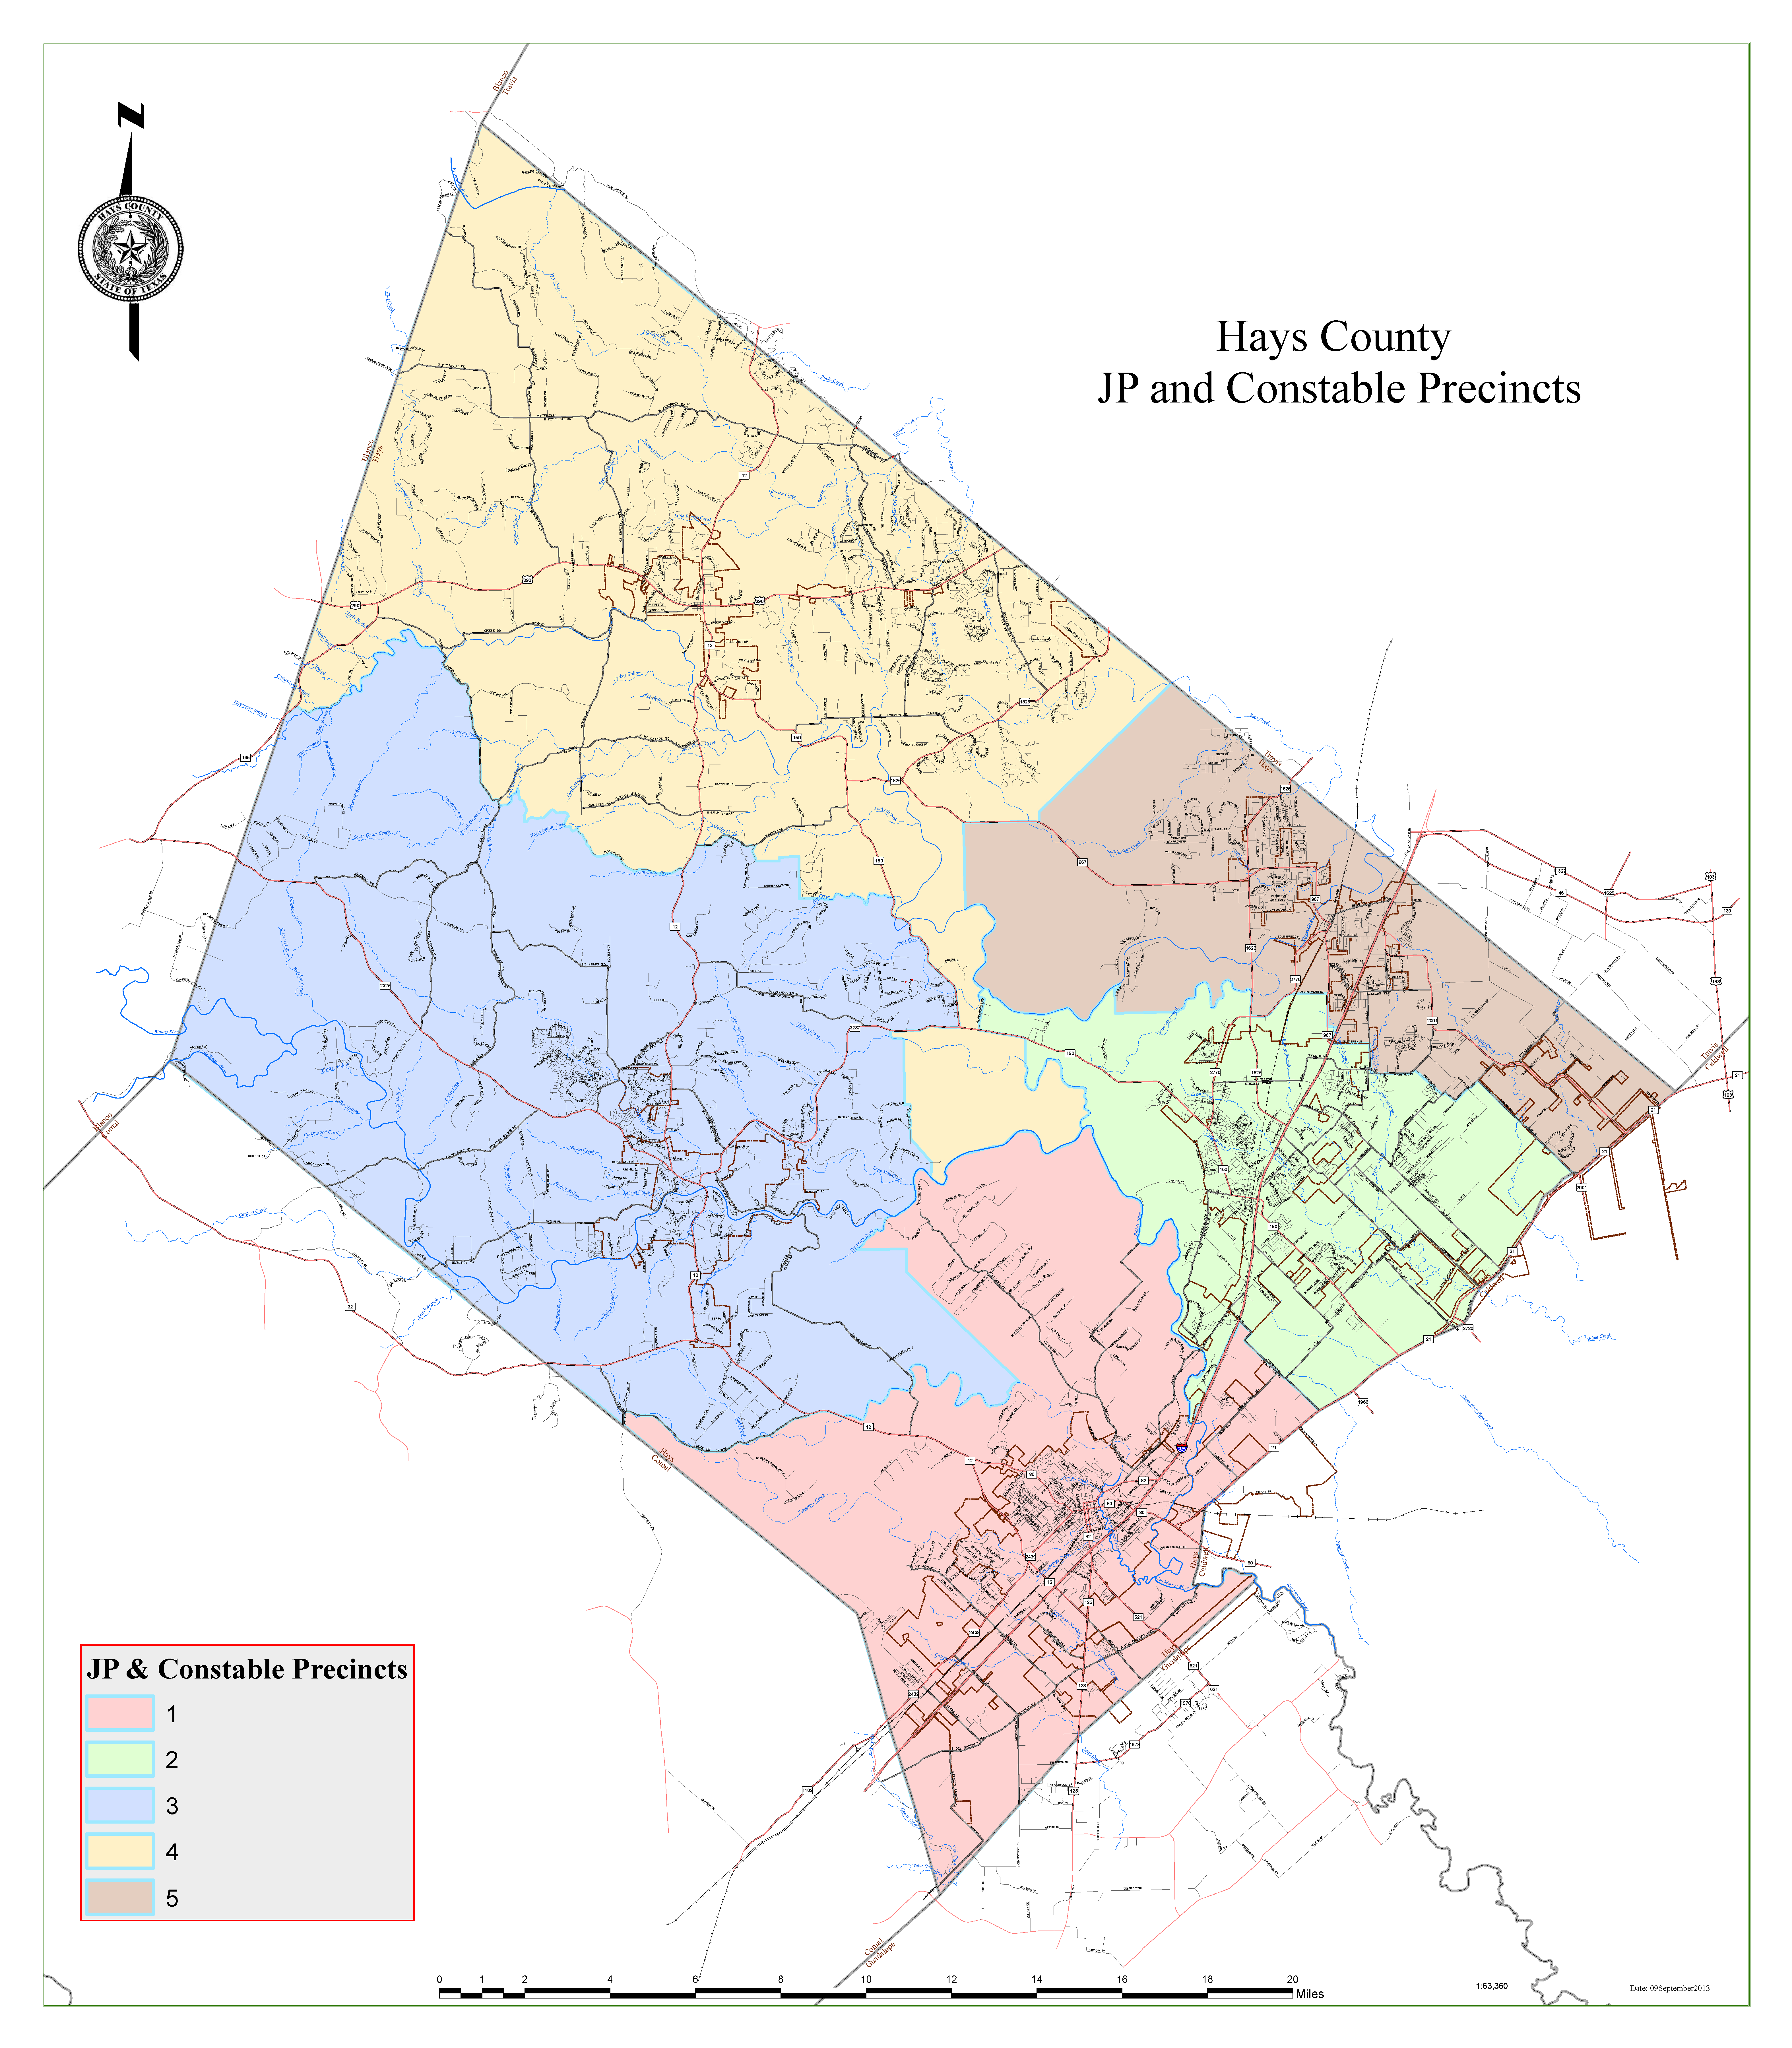 JP and Constable Precincts